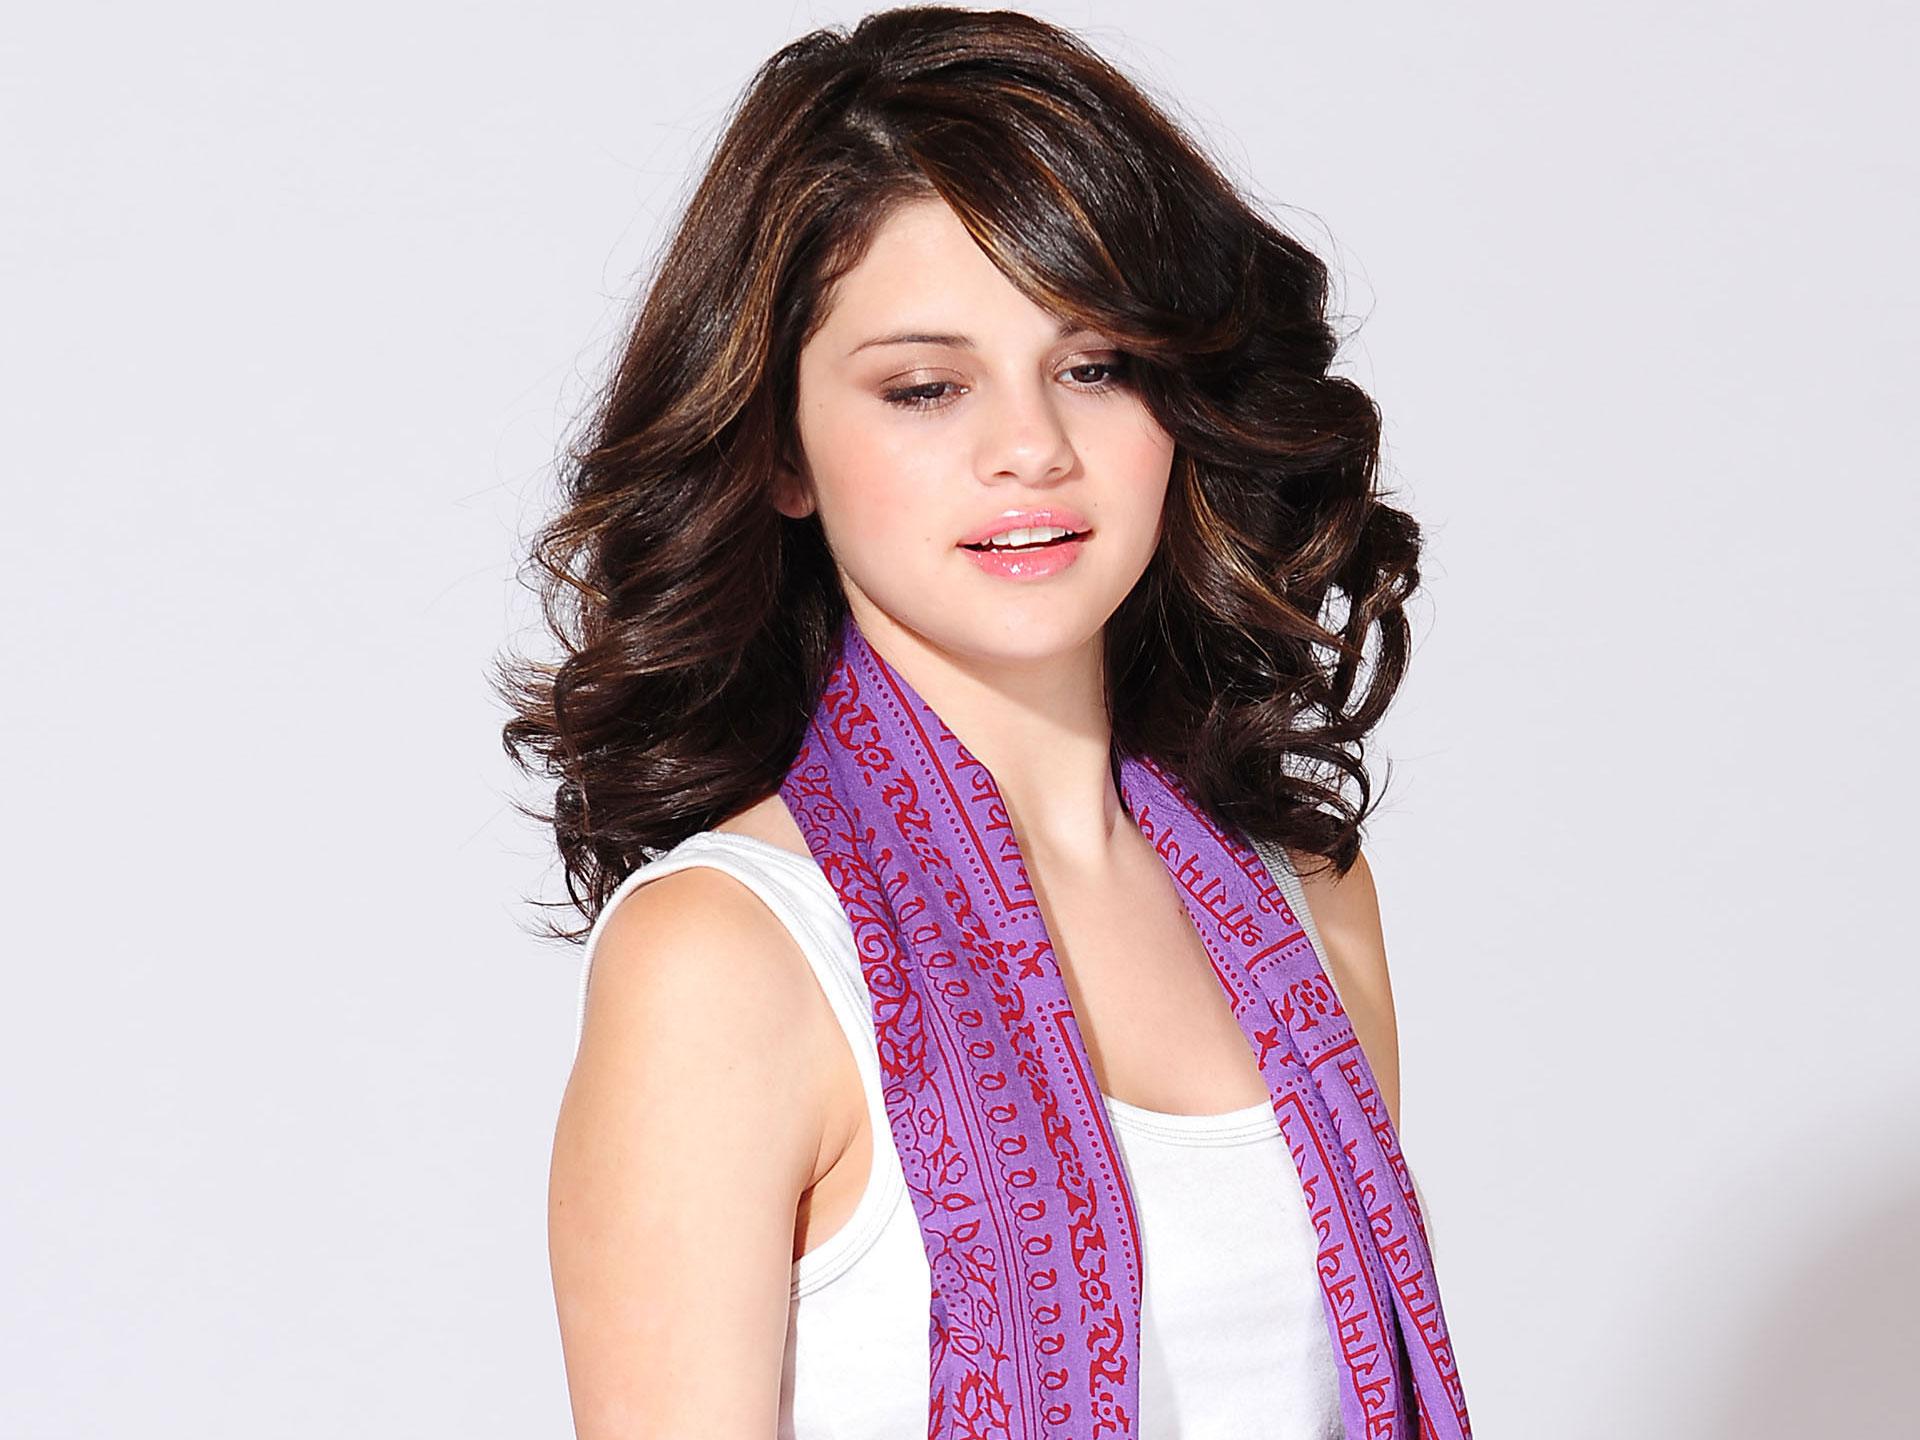 HD Wallpapers Selena Gomez 23